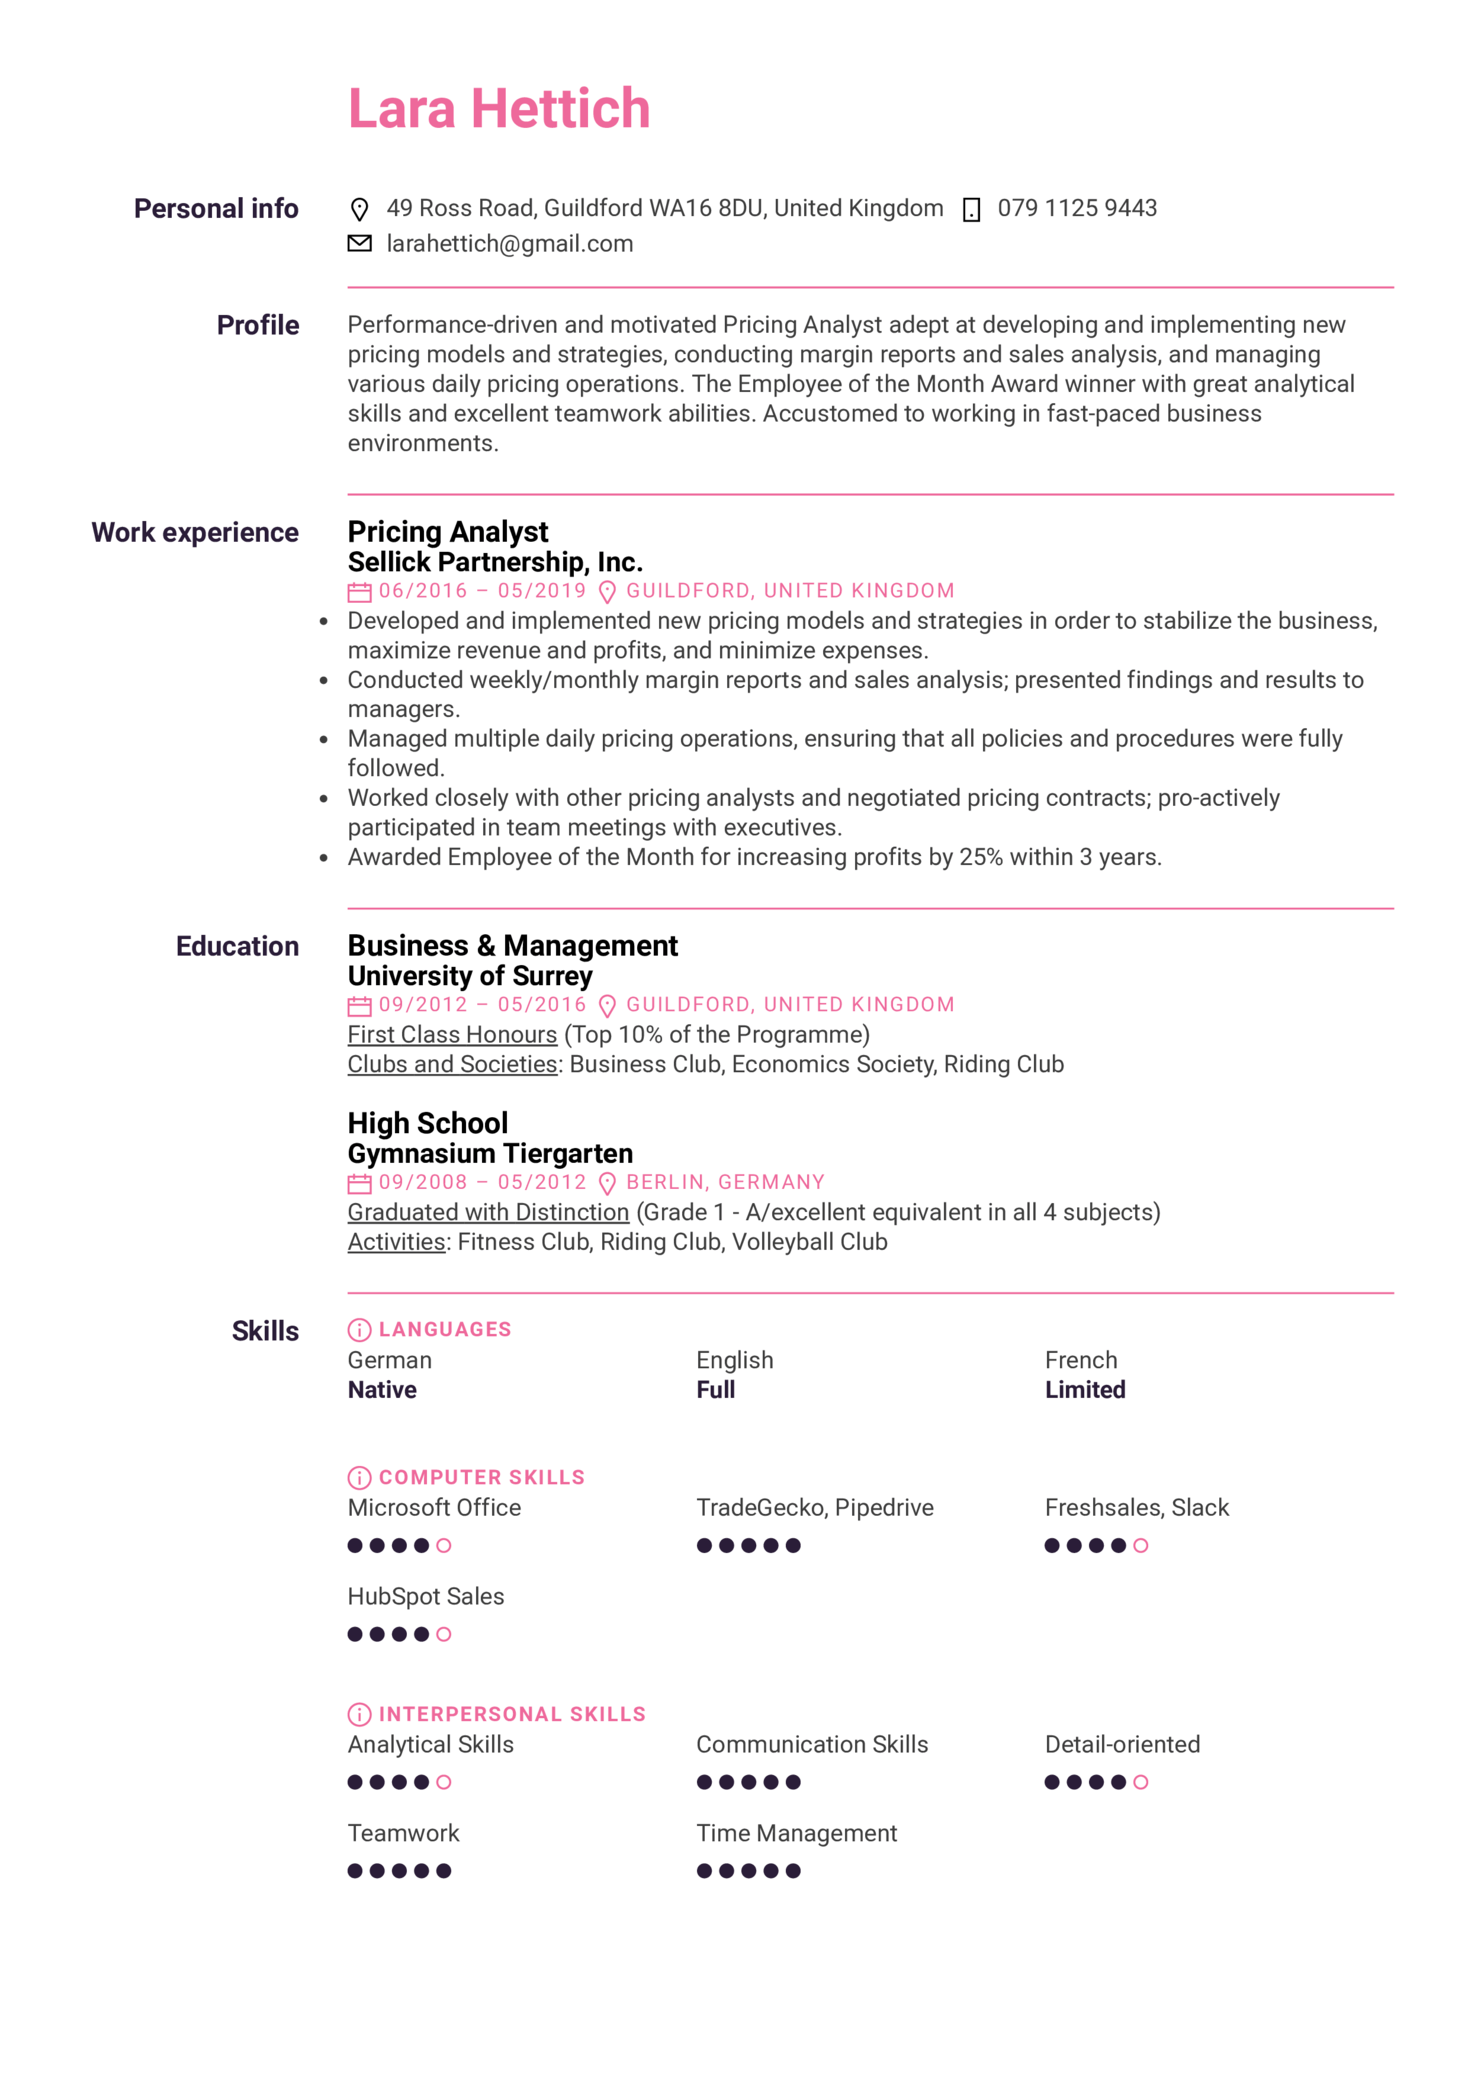 Pricing Analyst Resume Sample (parte 1)